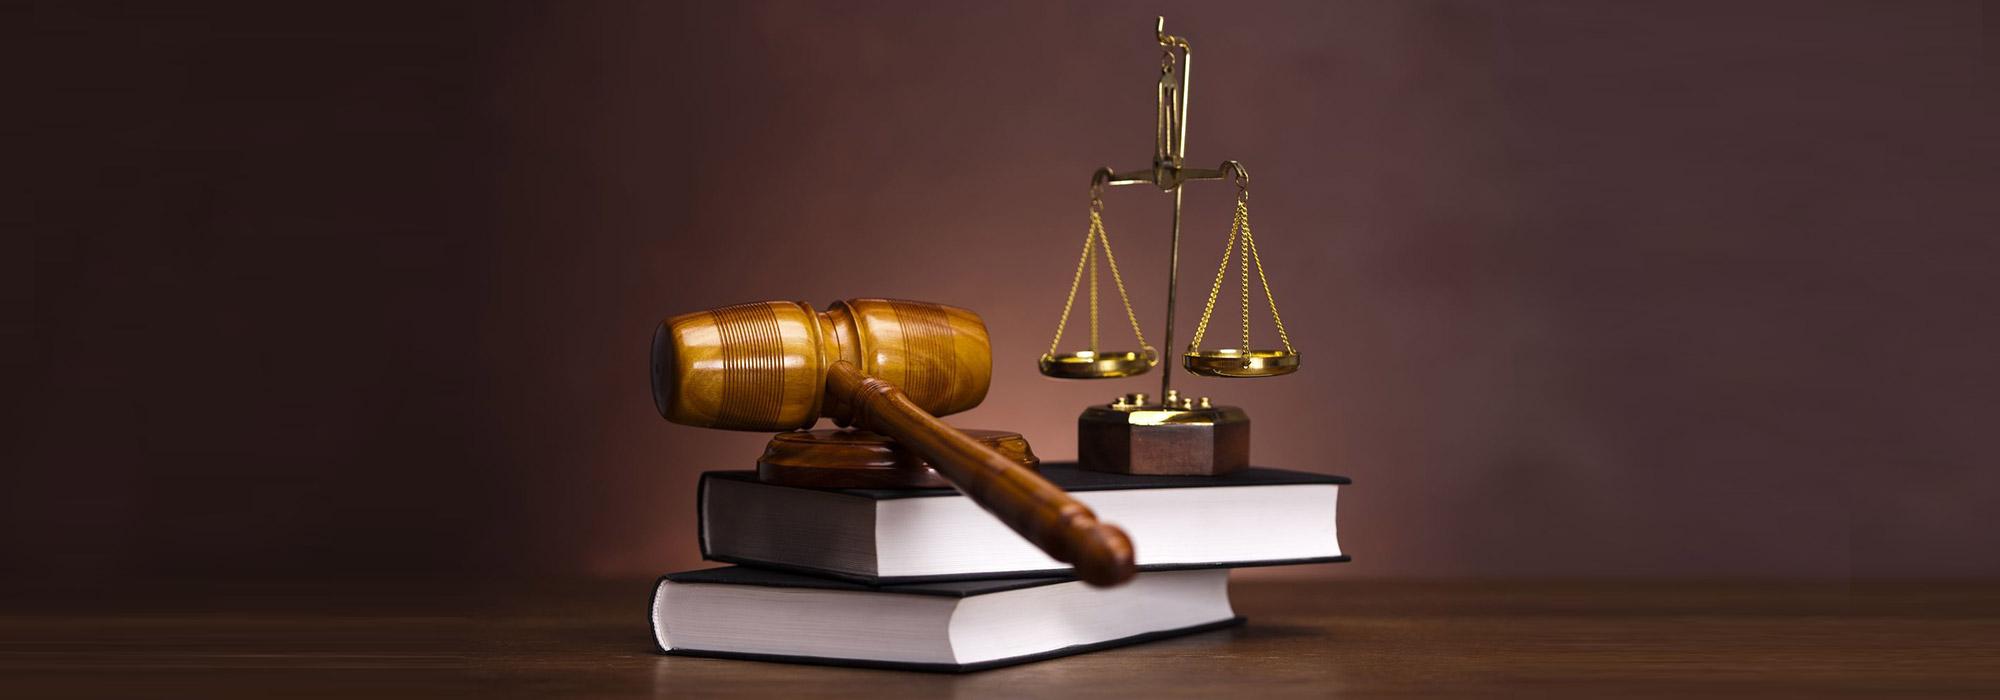 Decoding Laws Simplifying Life